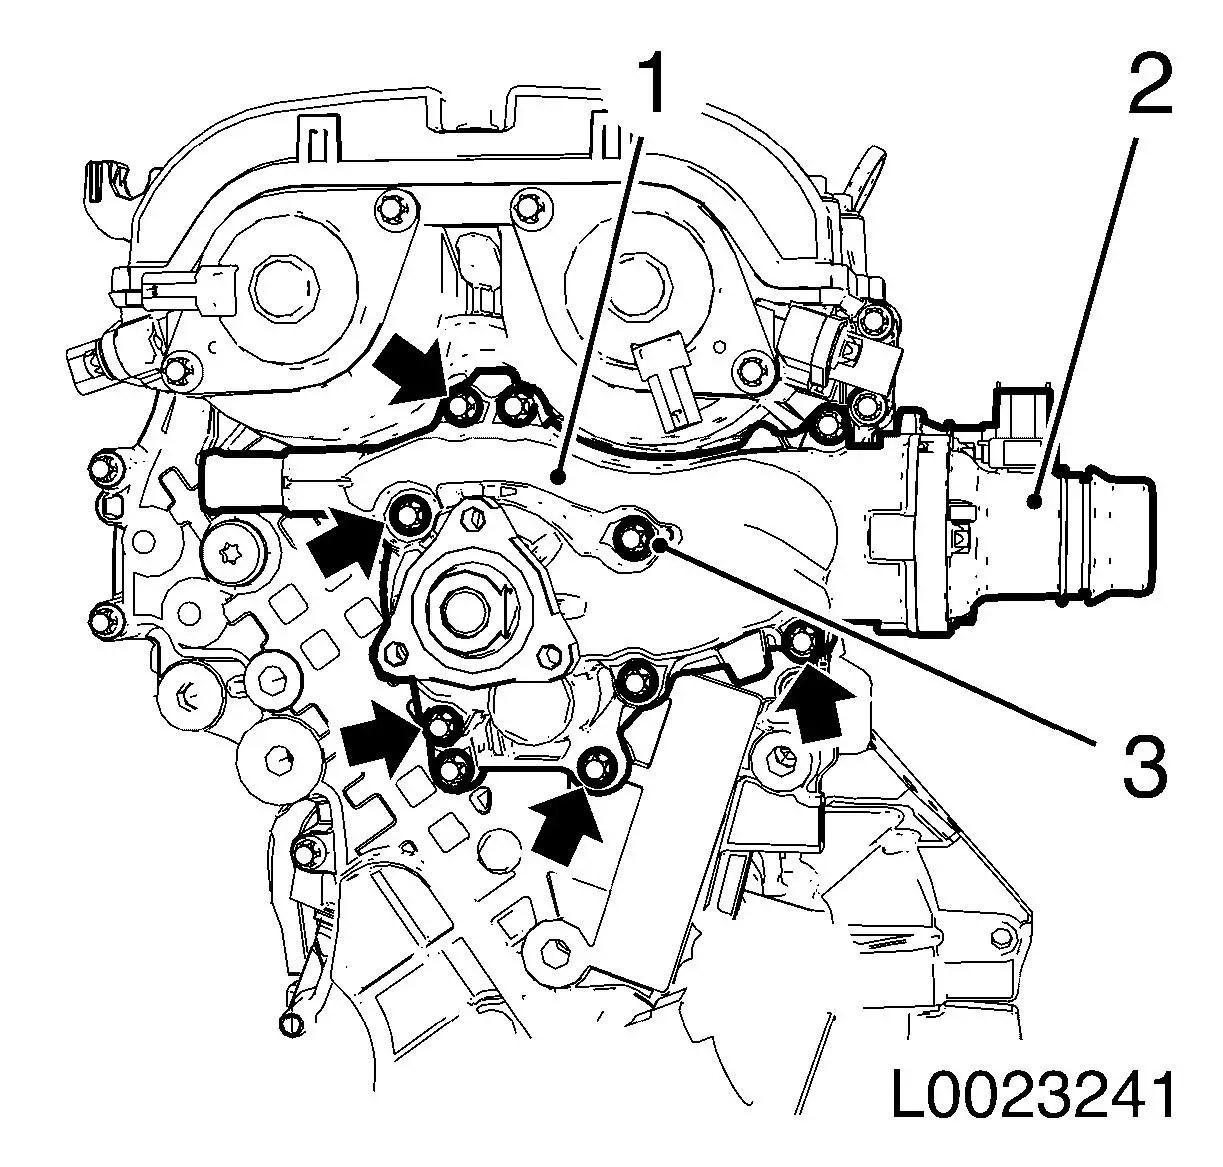 Vauxhall Workshop Manuals Gt Corsa D Gt J Engine And Engine Aggregates Gt Dohc Petrol Engine